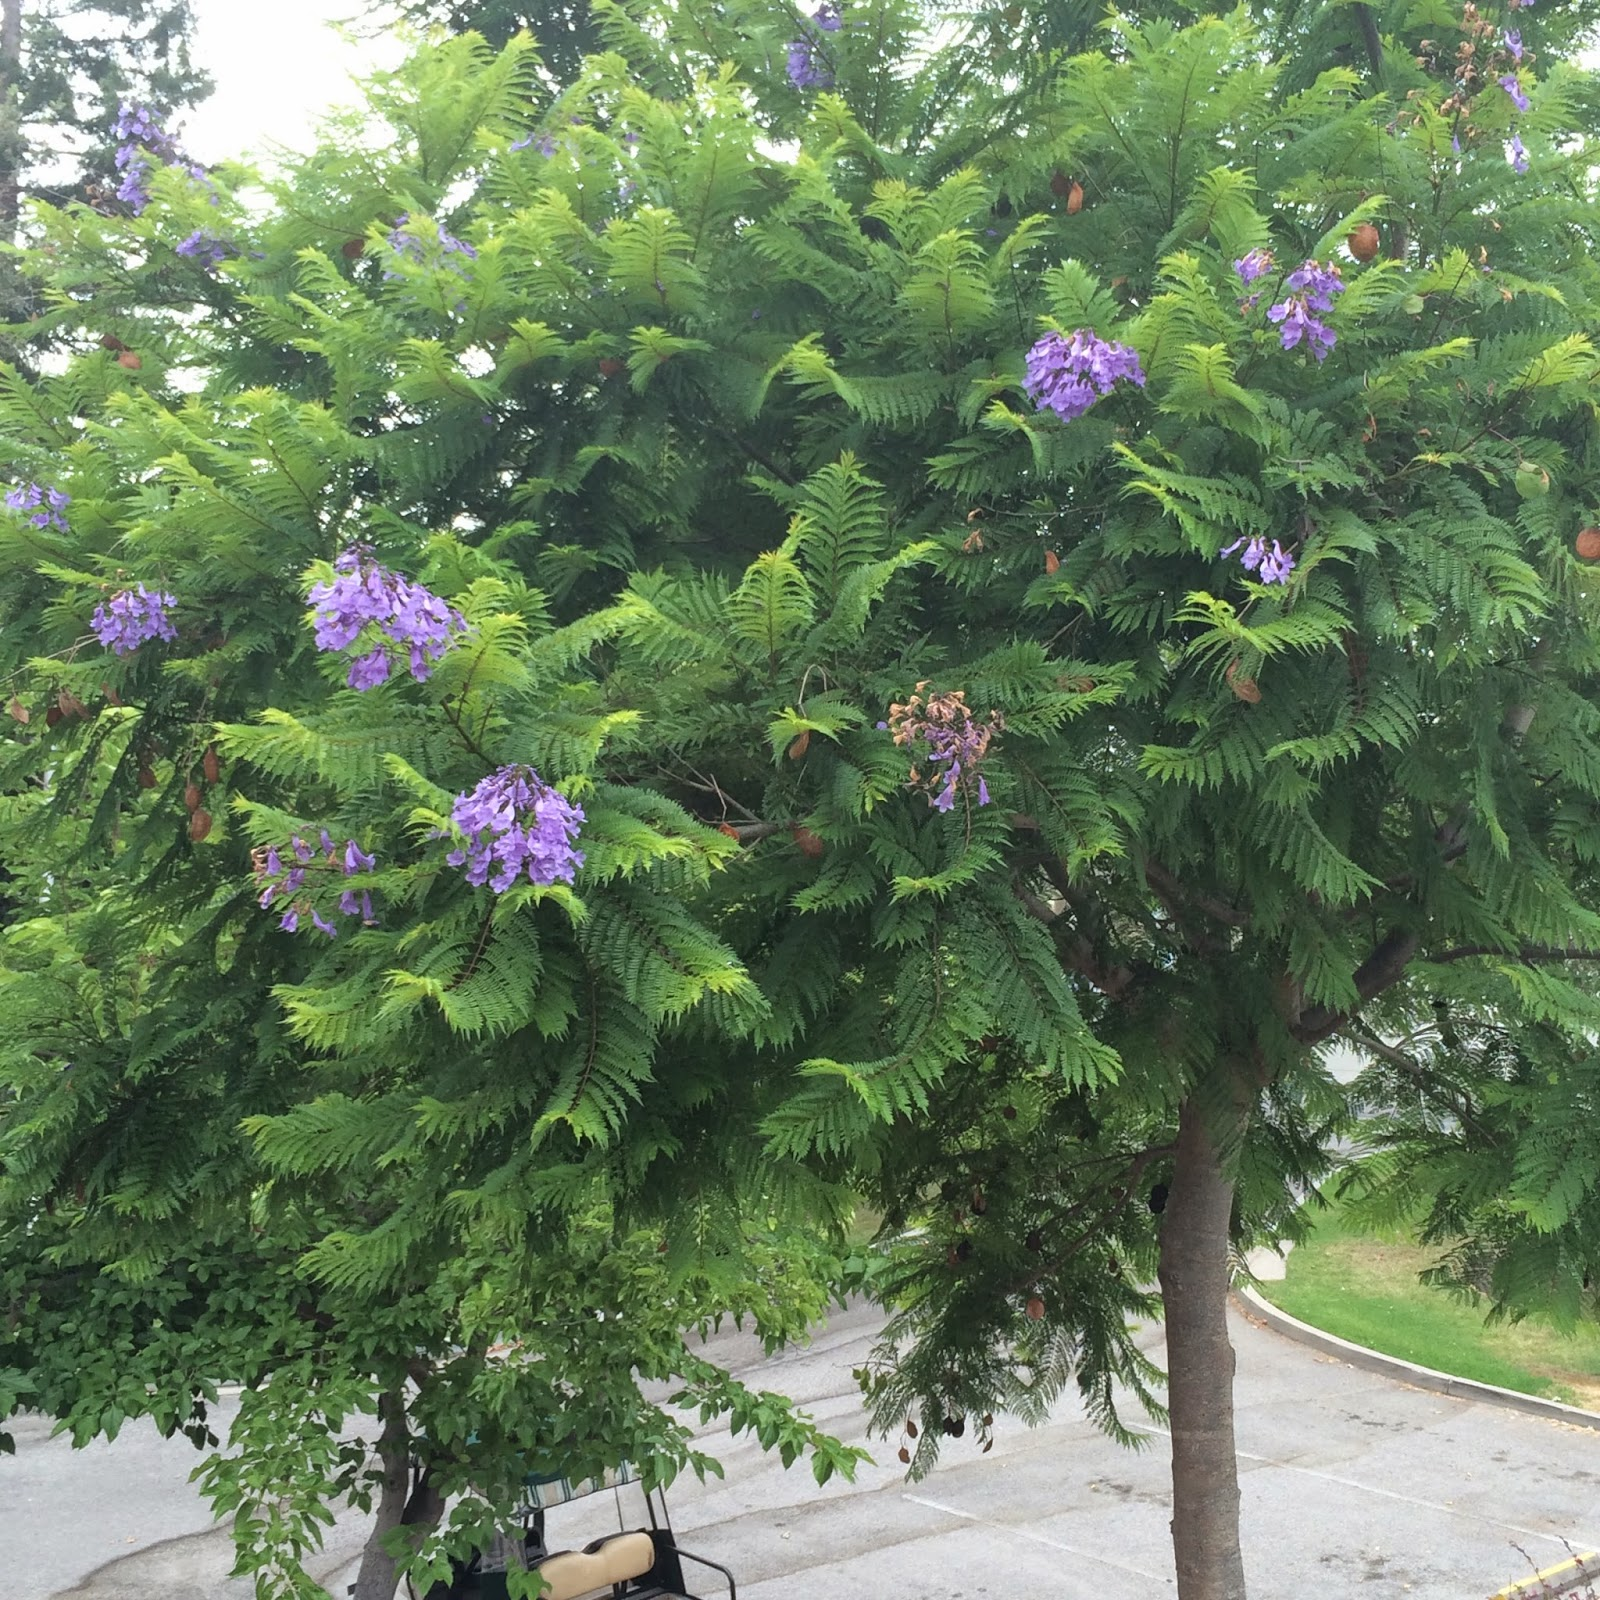 Trees of Santa Cruz County: Jacaranda mimosifolia - Jacaranda